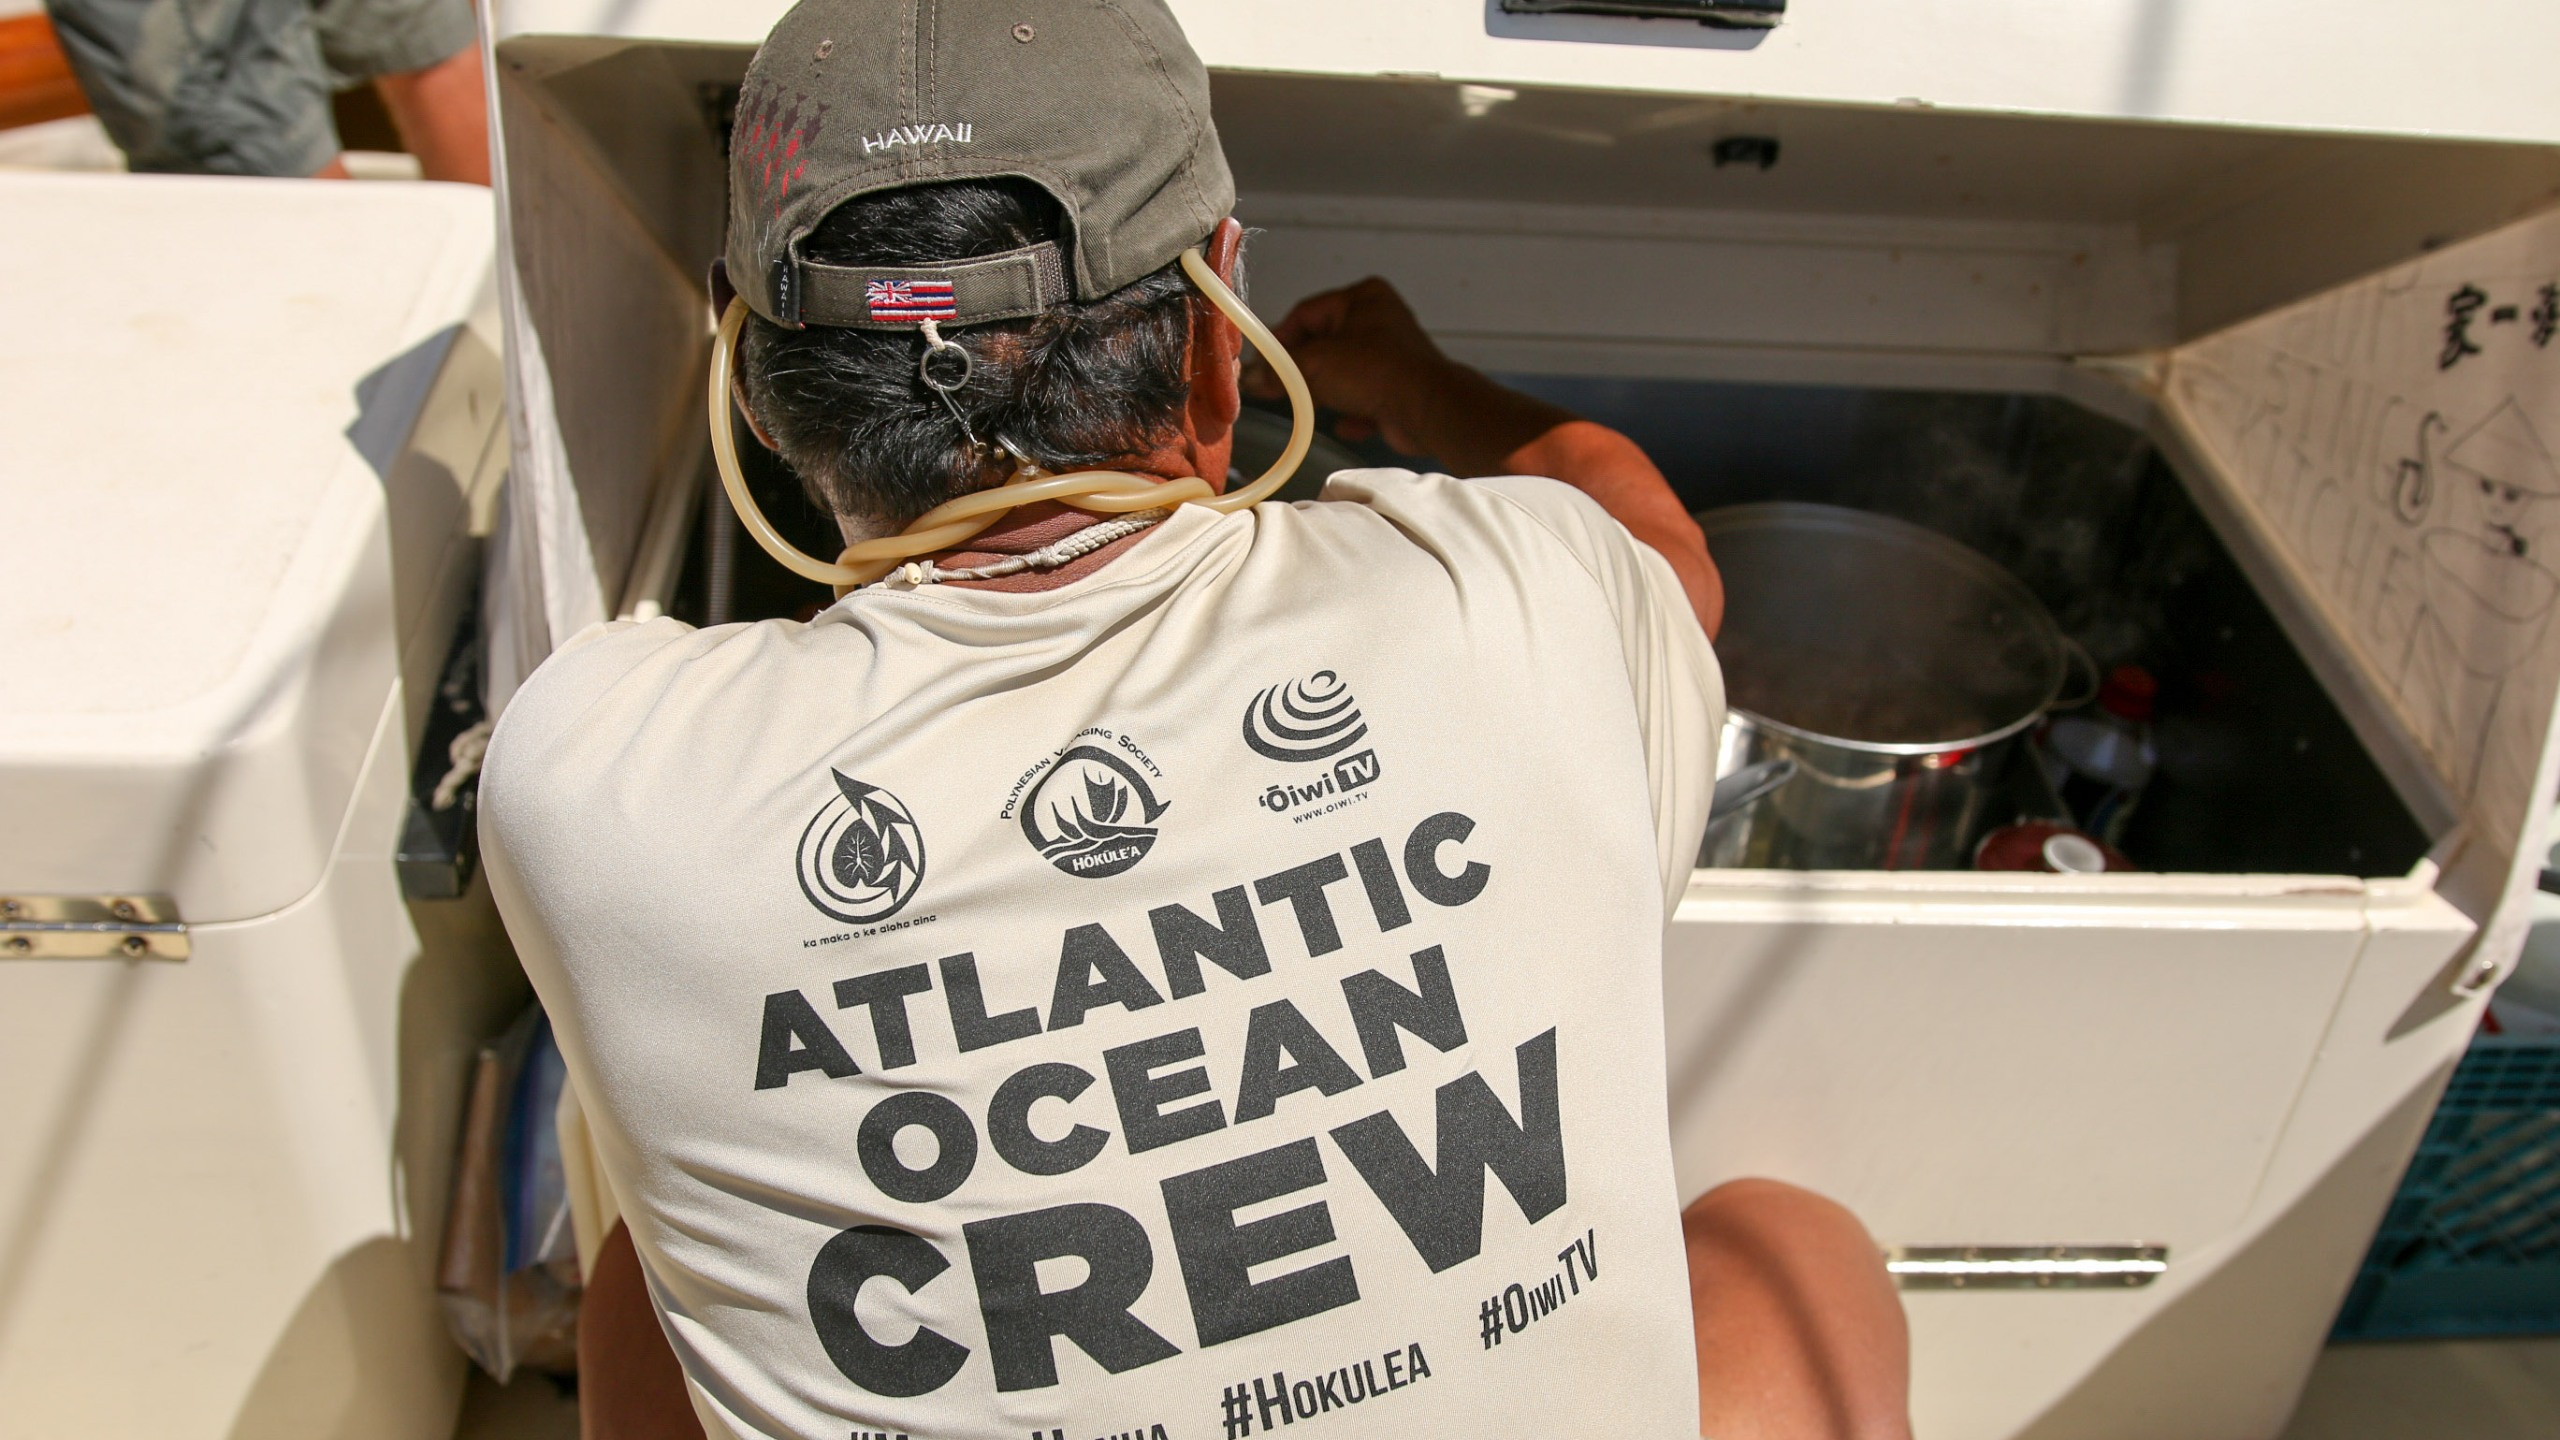 ATLANTIC OCEAN CREW_135756